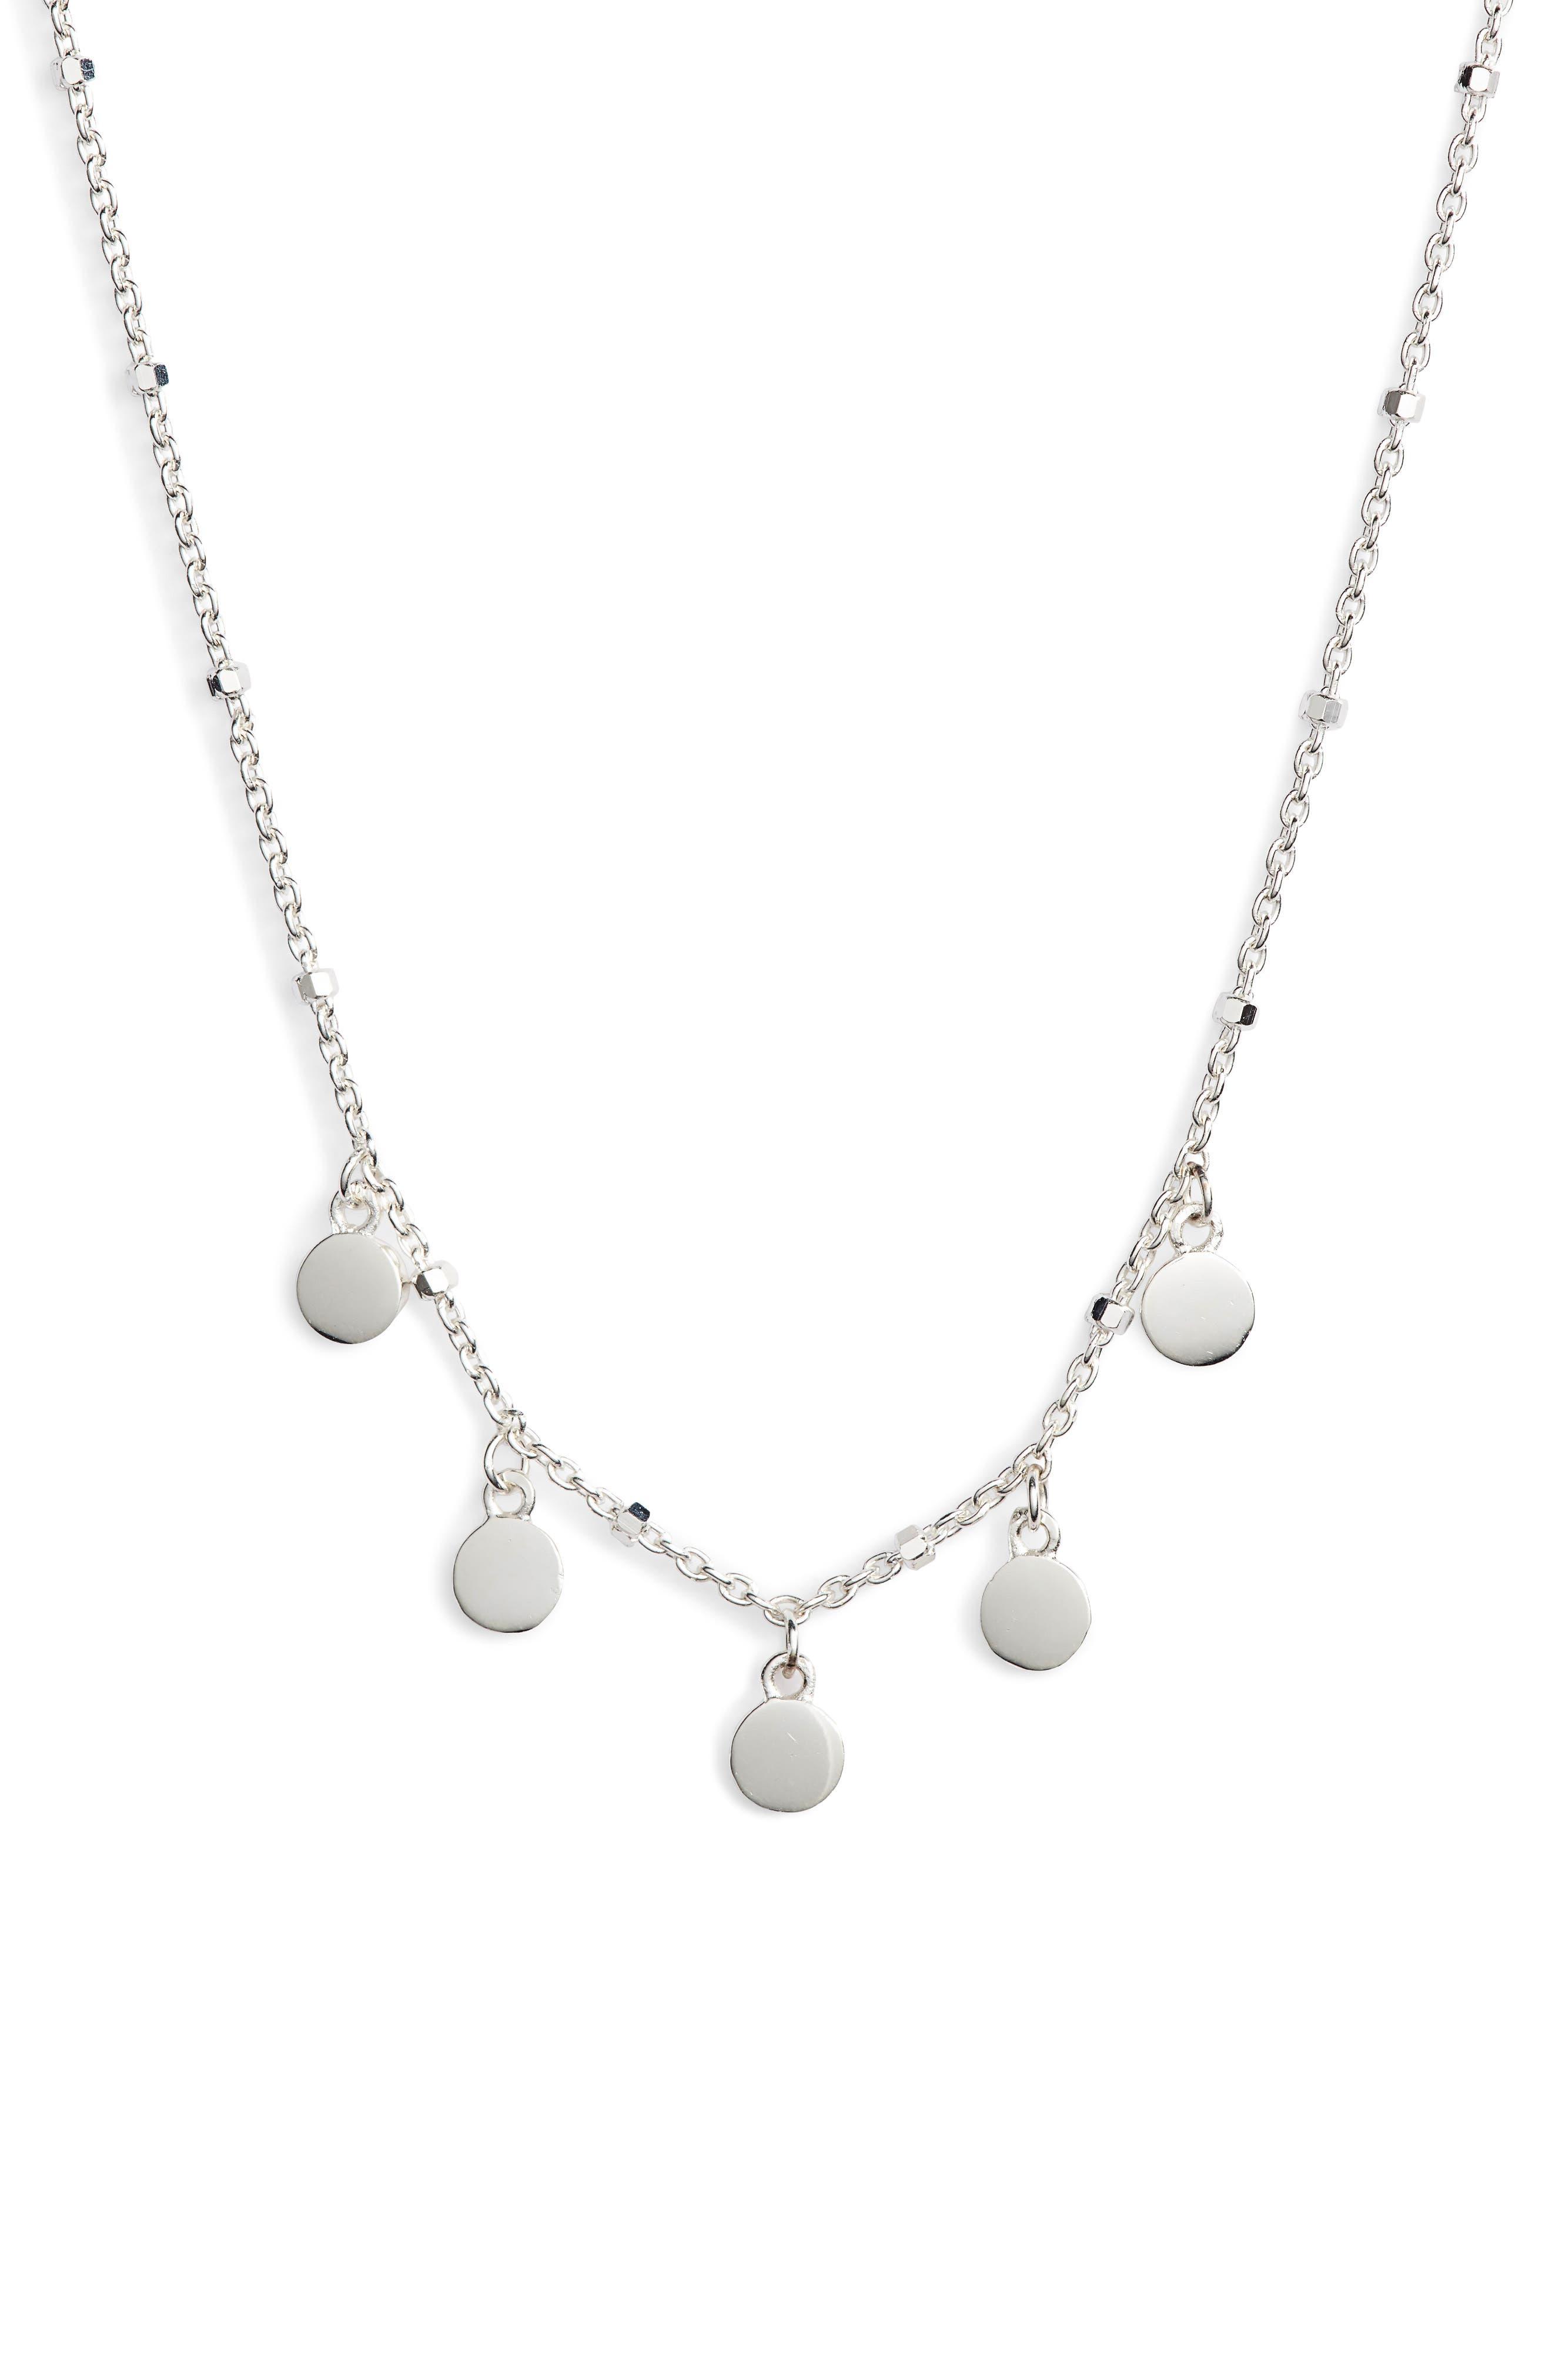 Mirror Charm Short Necklace,                             Main thumbnail 1, color,                             040